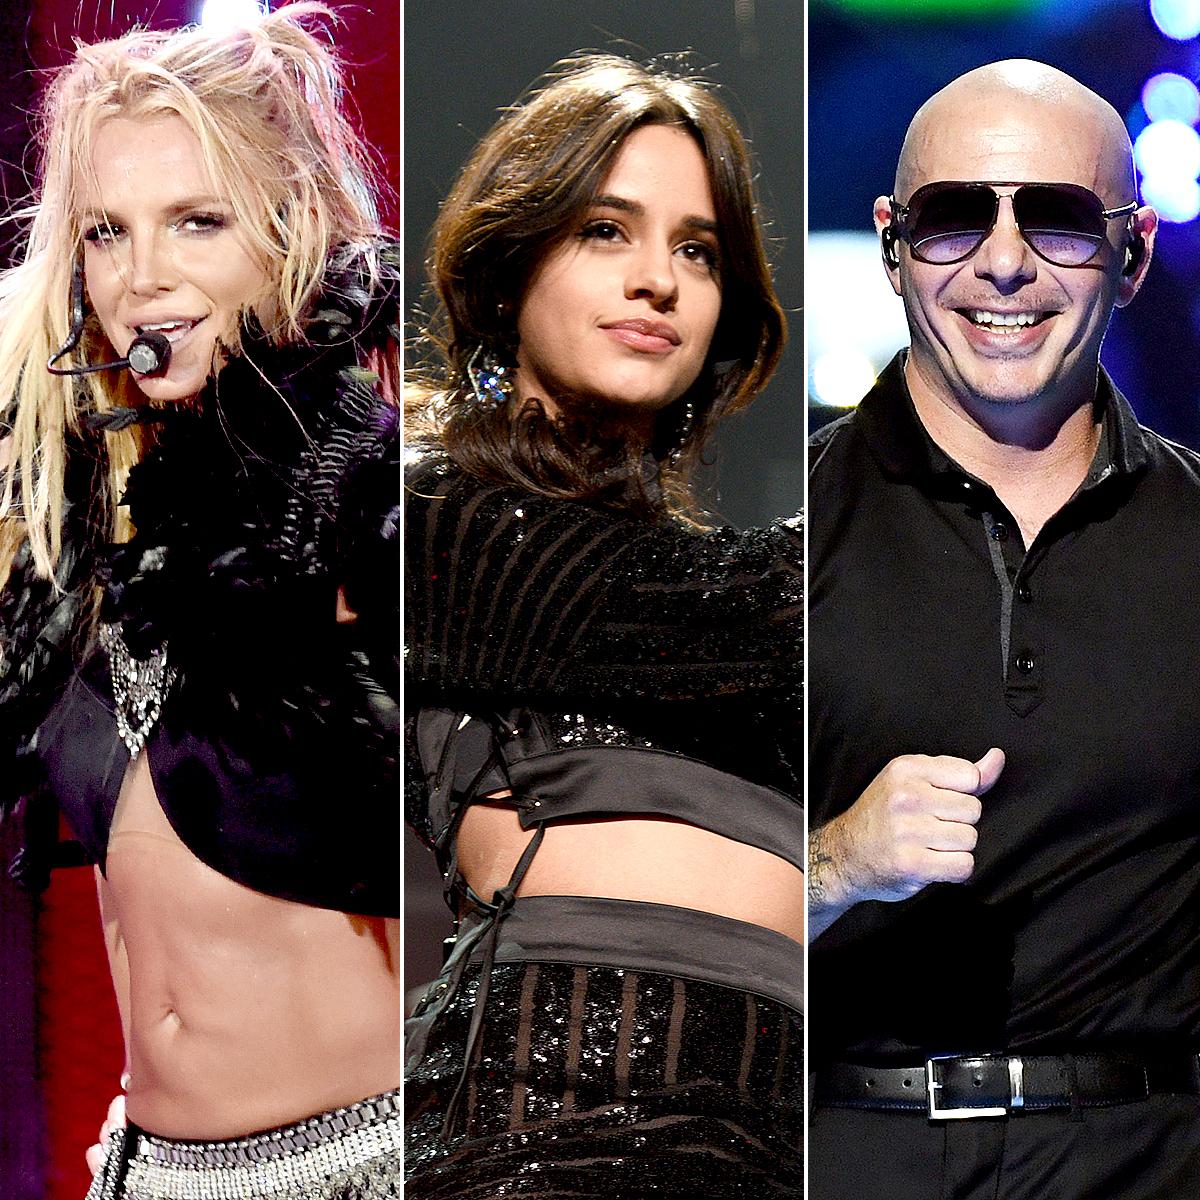 Britney Spears, Camila Cabello, and Pitbull